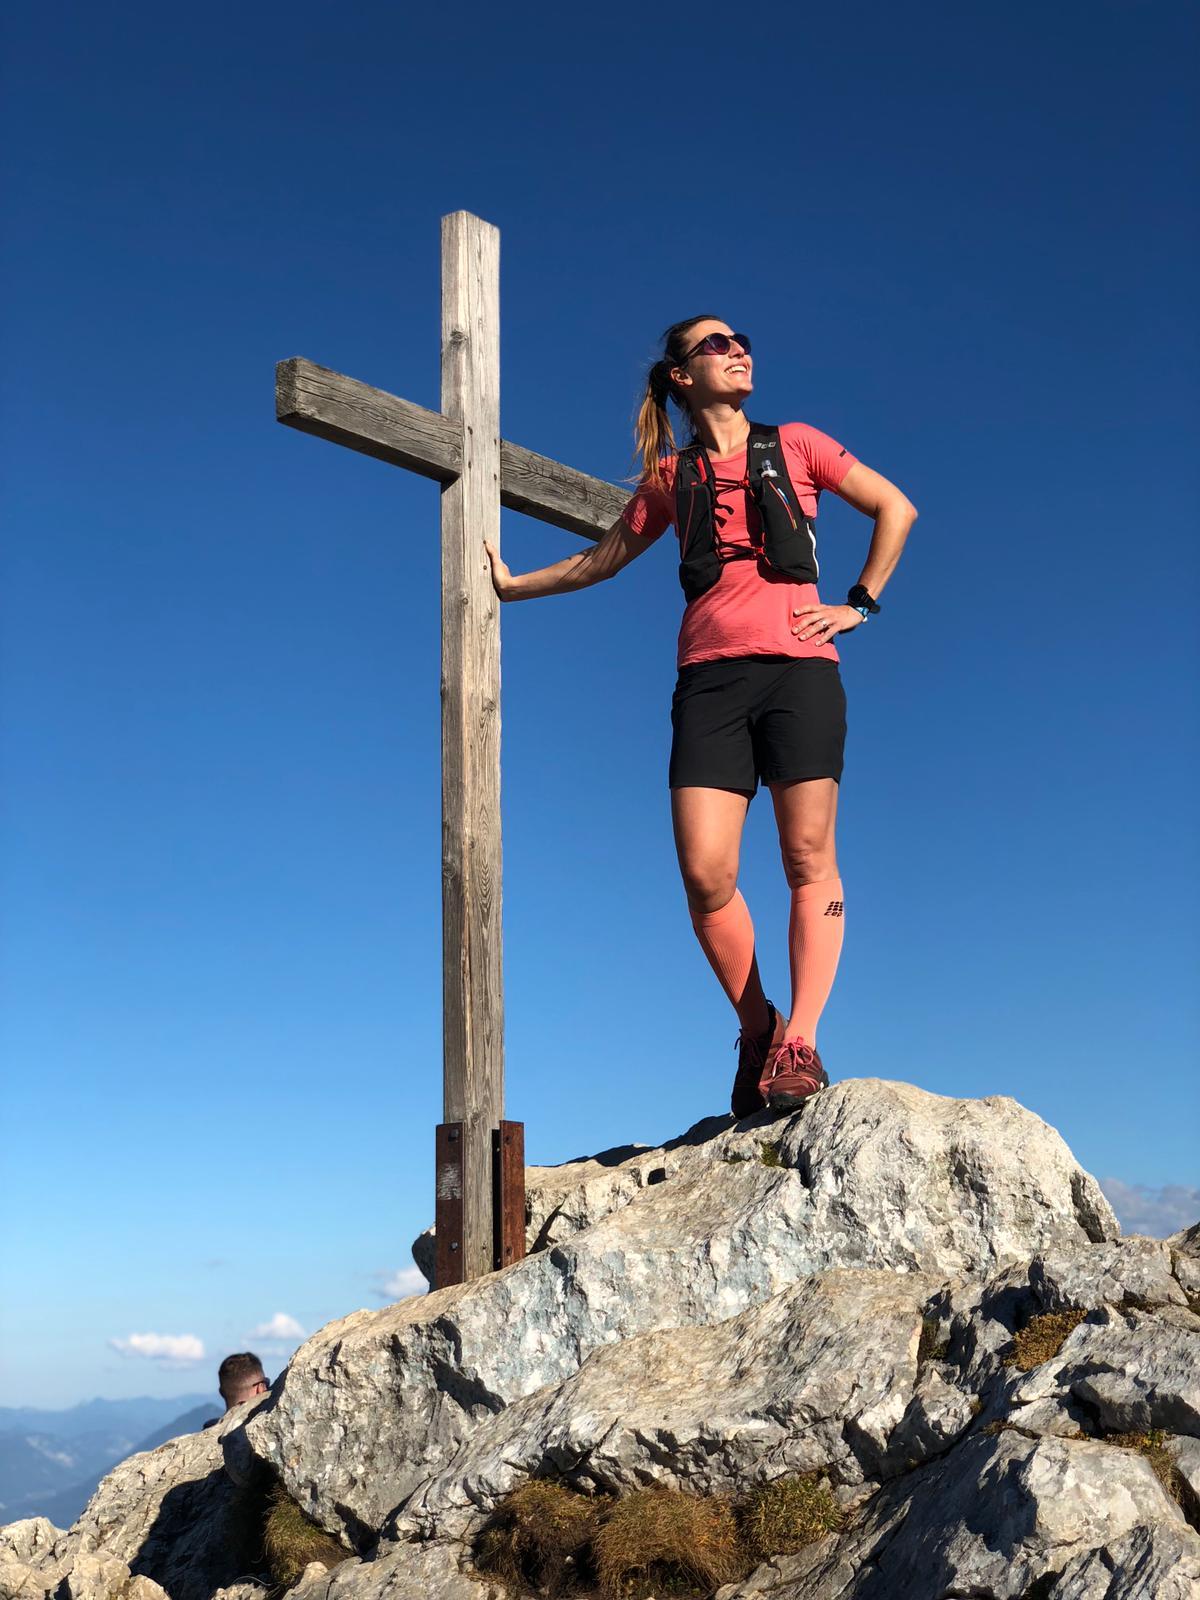 Trailrunning Tiroler Zugspitz Arena Munich Mountain Girls Gipfel